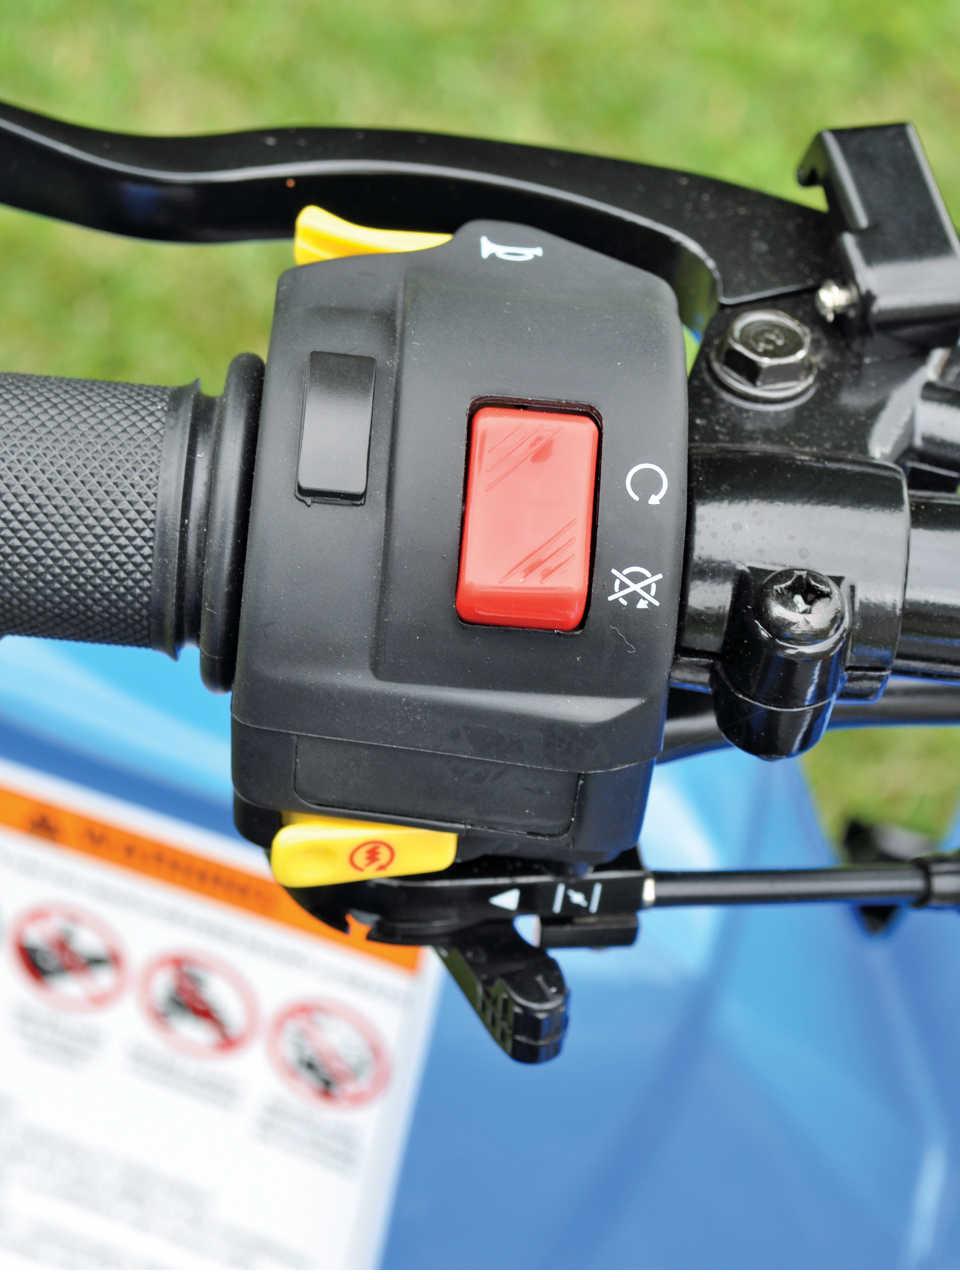 Mini Quad Test The Polaris Outlaw 90 Atv Illustrated Predator Fuel Filter 2014polarisoutlaw90close Upthumb Switches